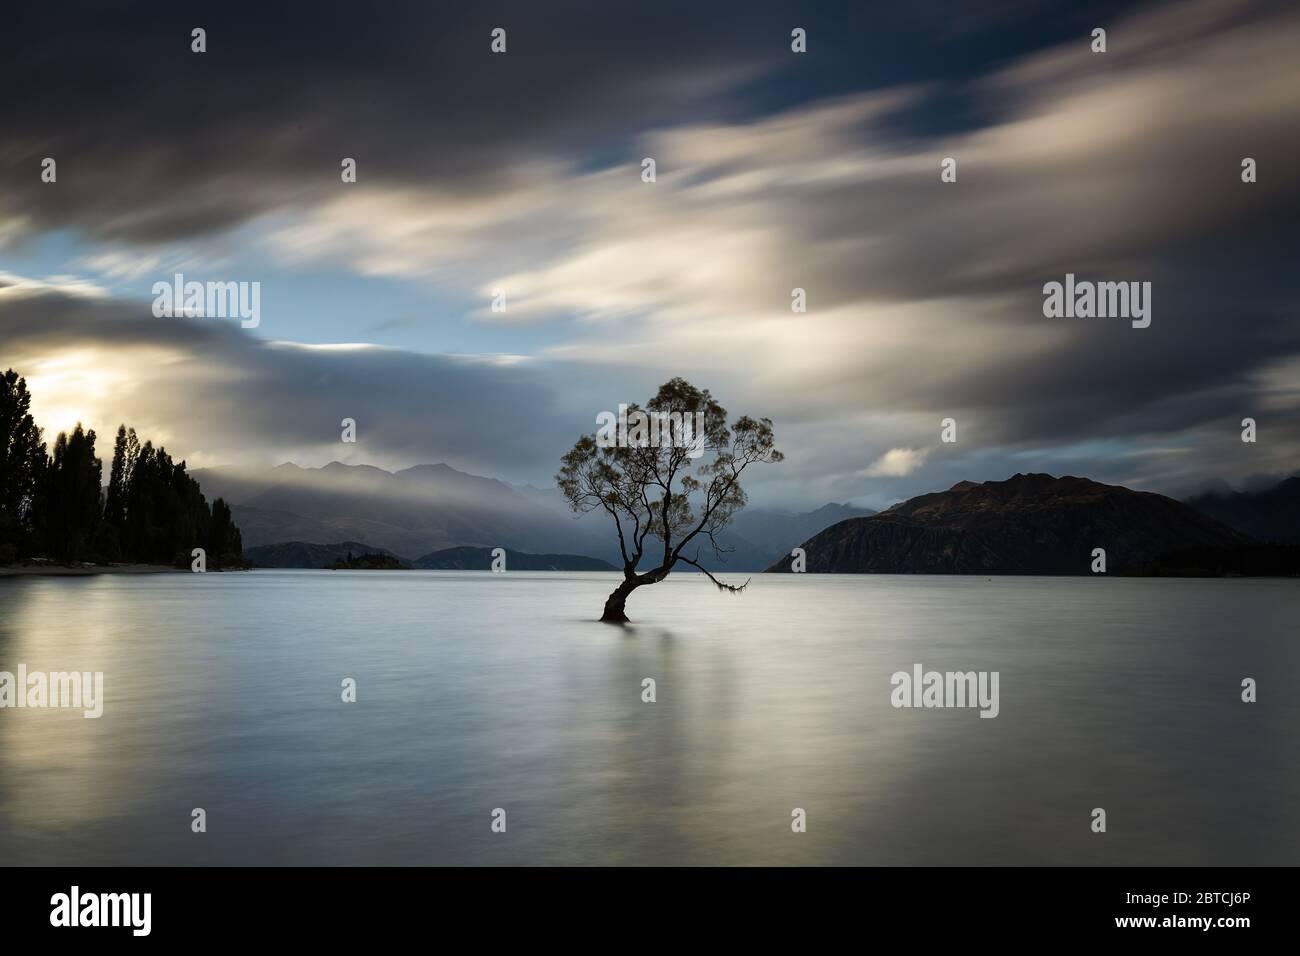 That Wanaka Tree with a sunbeam hitting it, Wanaka, New Zealand, March 2020 Stock Photo